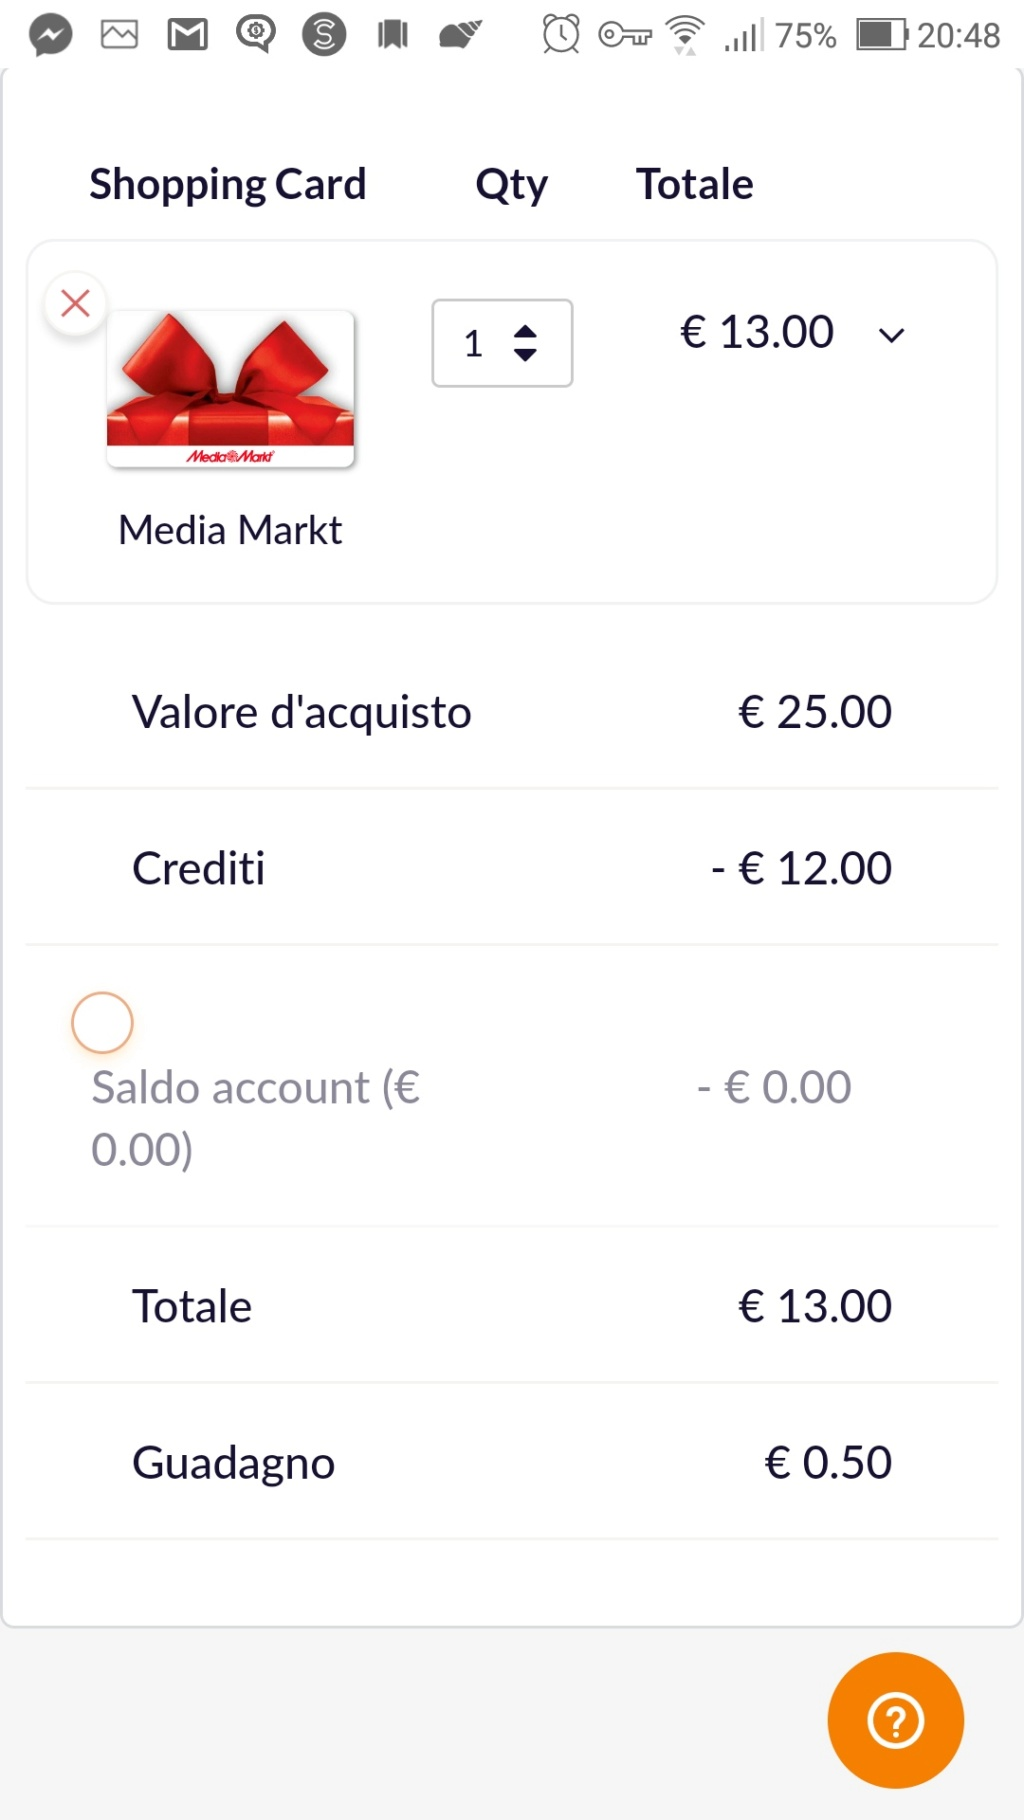 Oportunidade [Provado] Sixthcontinent - Vales Media Markt, Cepsa, Decathlon, Amazon.es etc por metade do preço! (já poupei 75€) Screen11